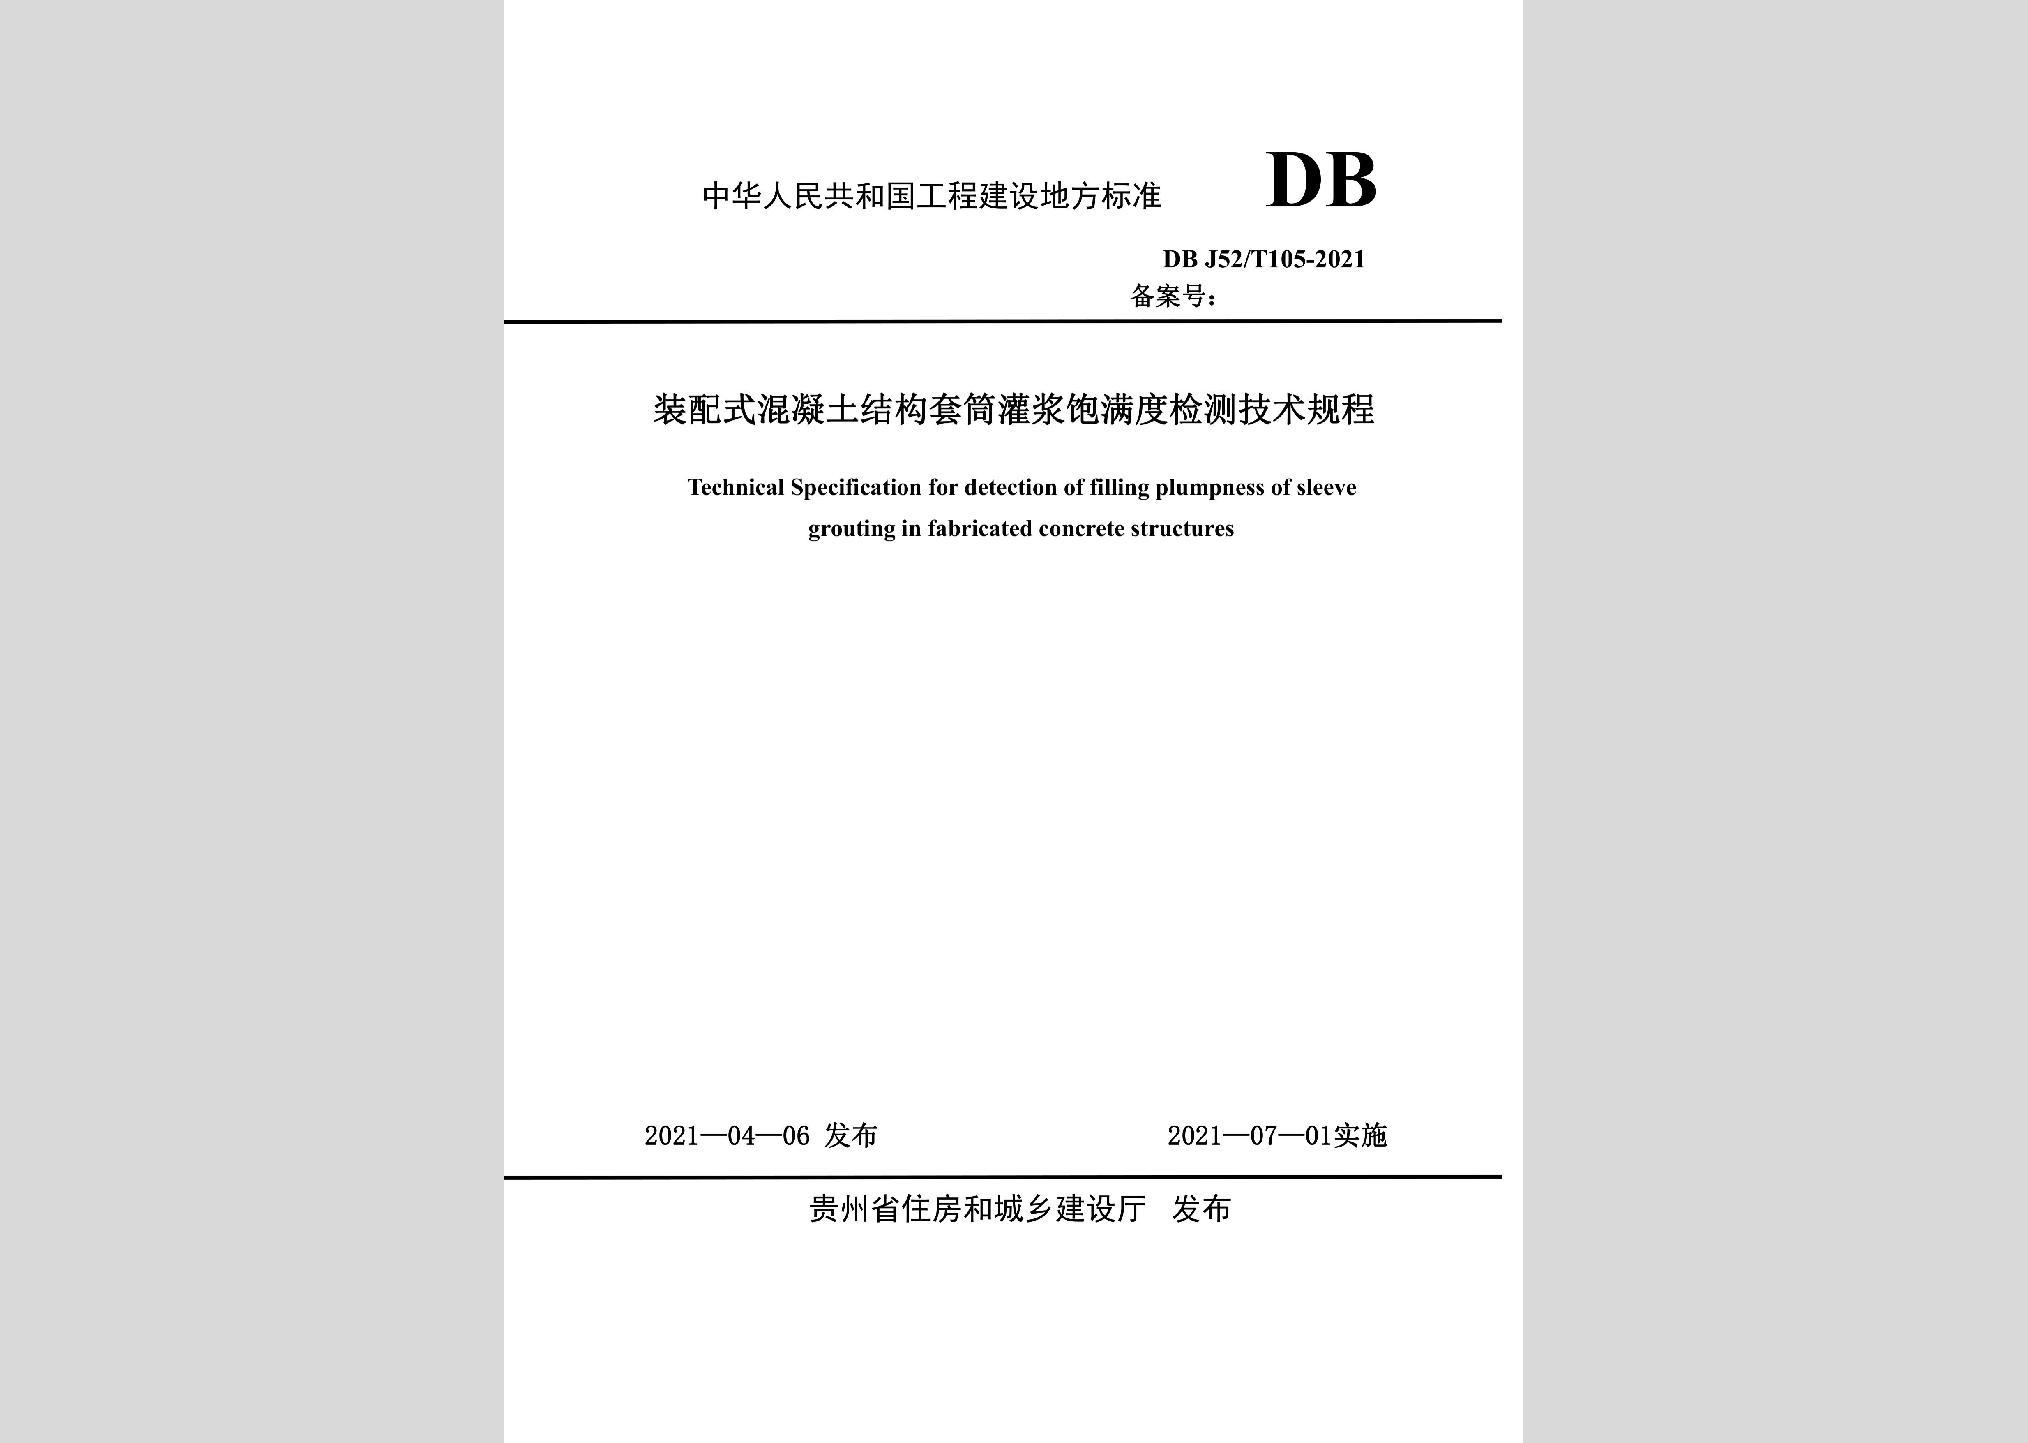 DBJ52/T105-2021:装配式混凝土结构套筒灌浆饱满度检测技术规程